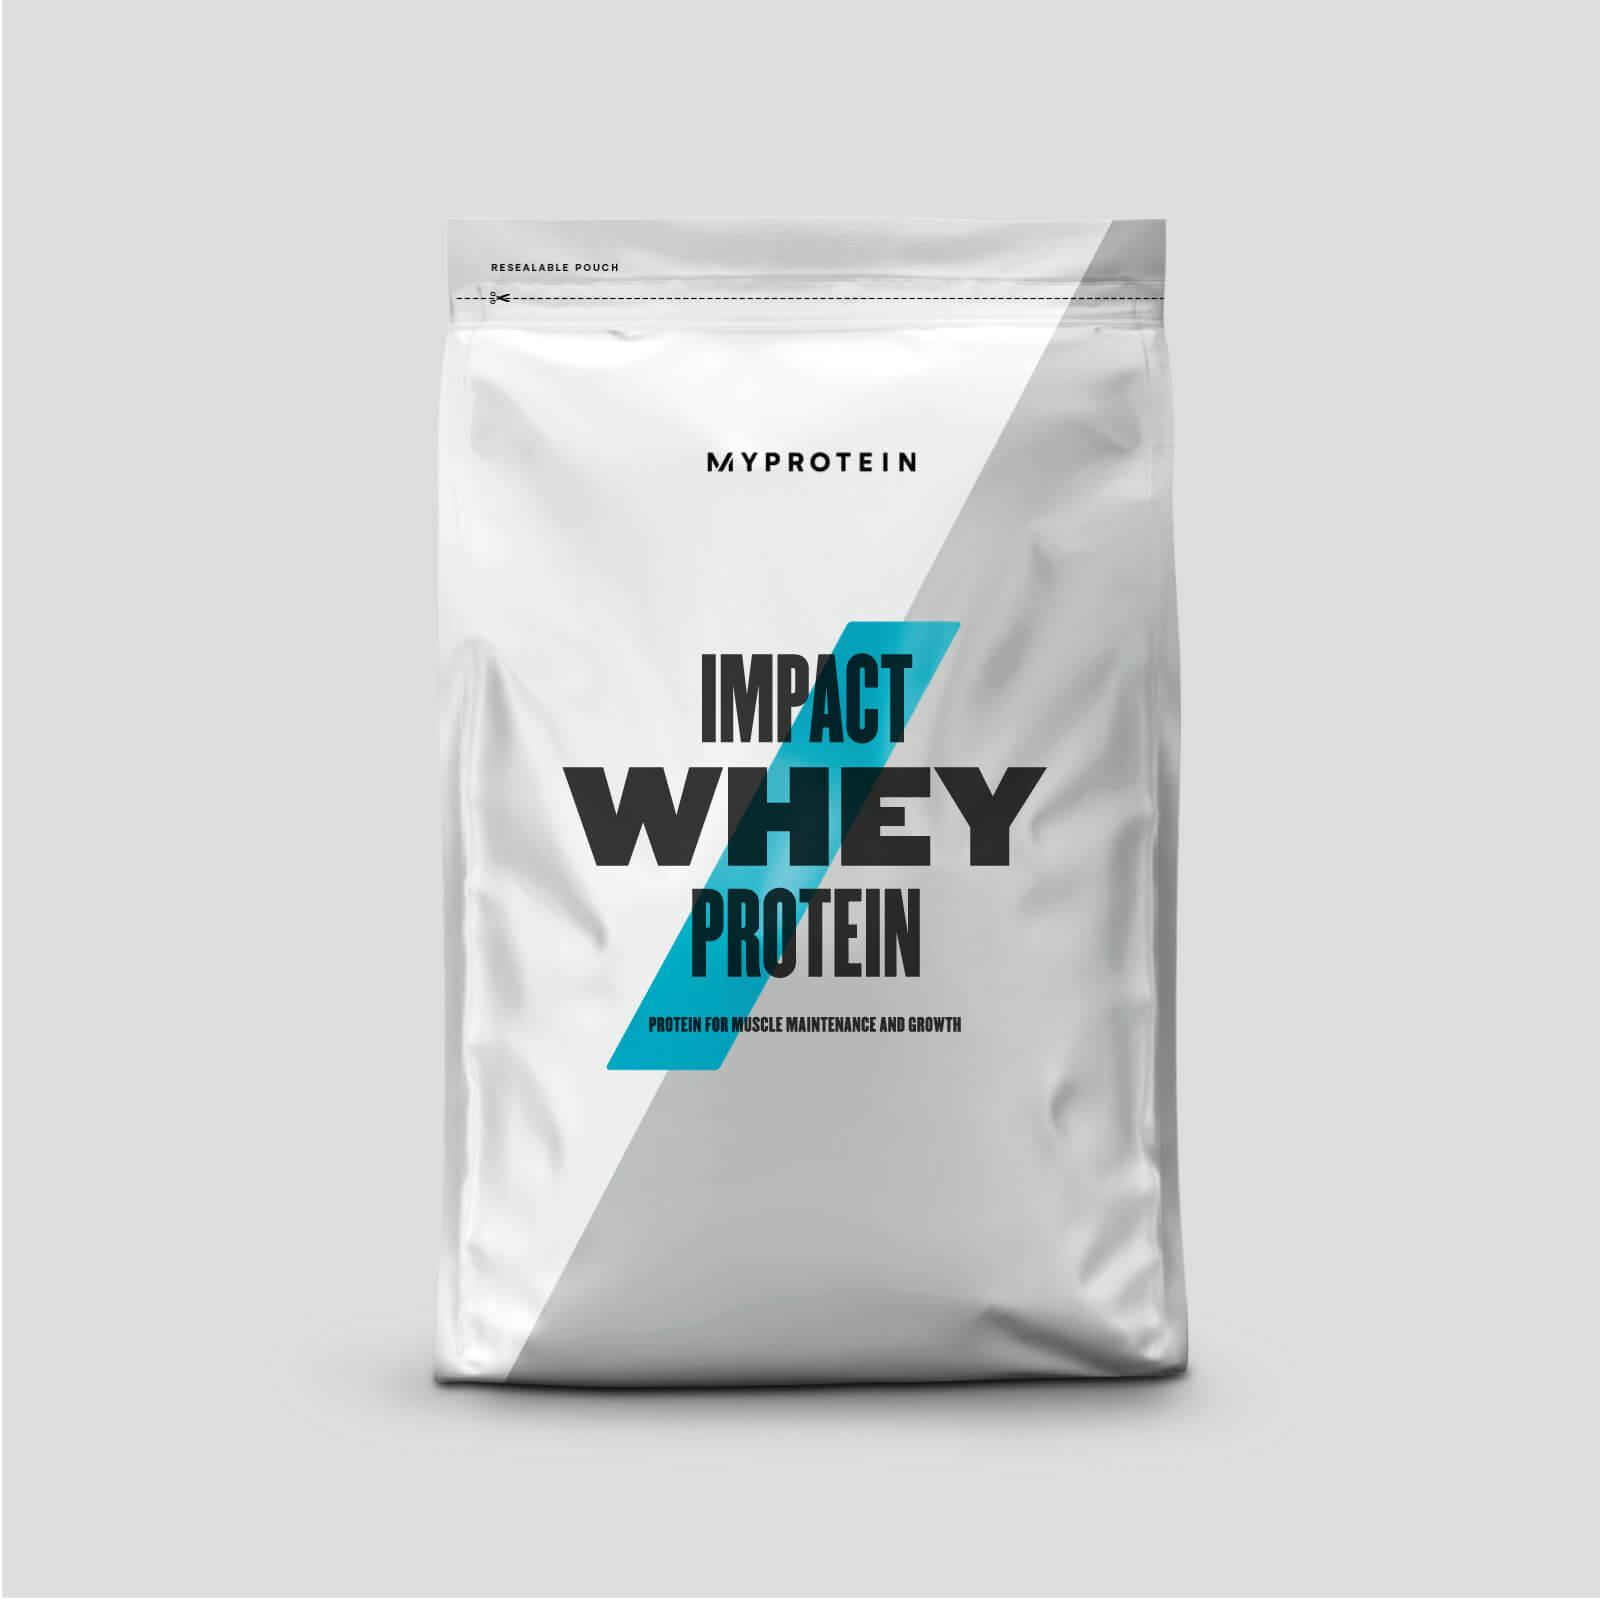 Myprotein Impact Whey Protein - 2.5kg - Sirop d'érable